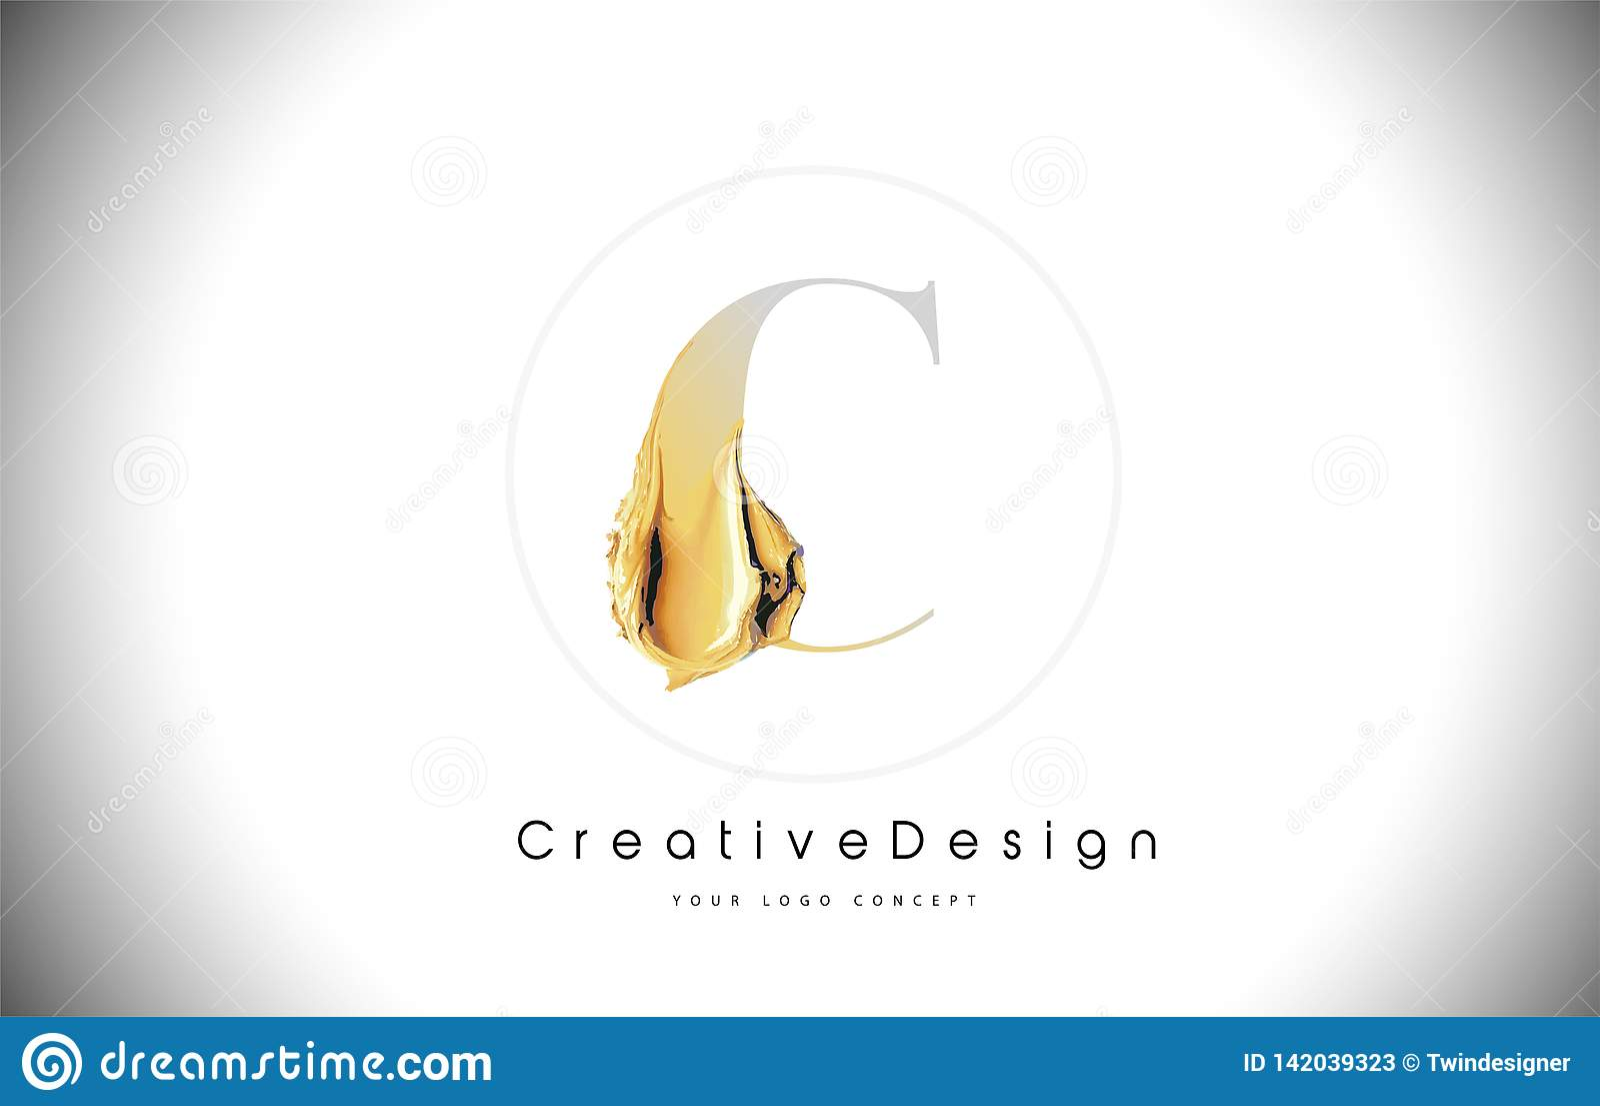 C Golden Letter Design Brush Paint Stroke. Gold Yellow c Letter Logo Icon with Artistic Paintbrush